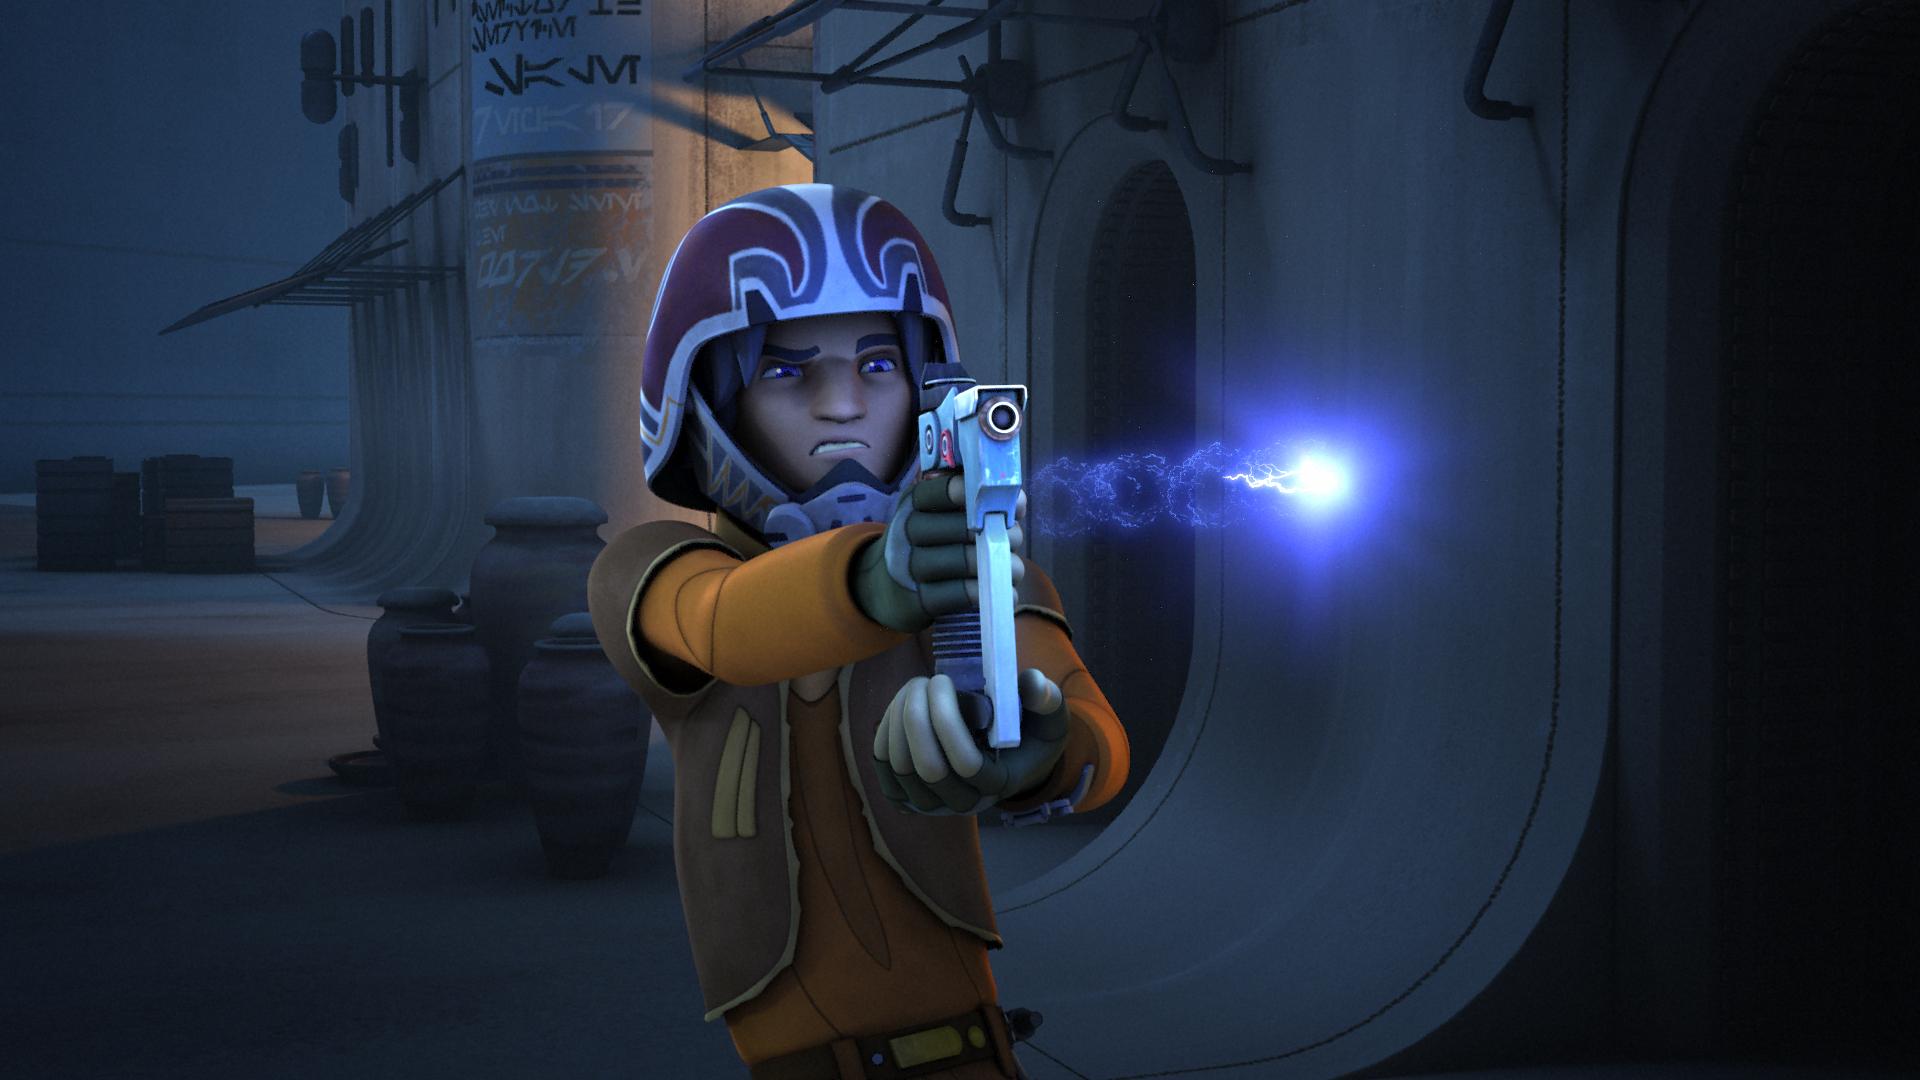 Ezra Bridger Star Wars Rebels 1920x1080